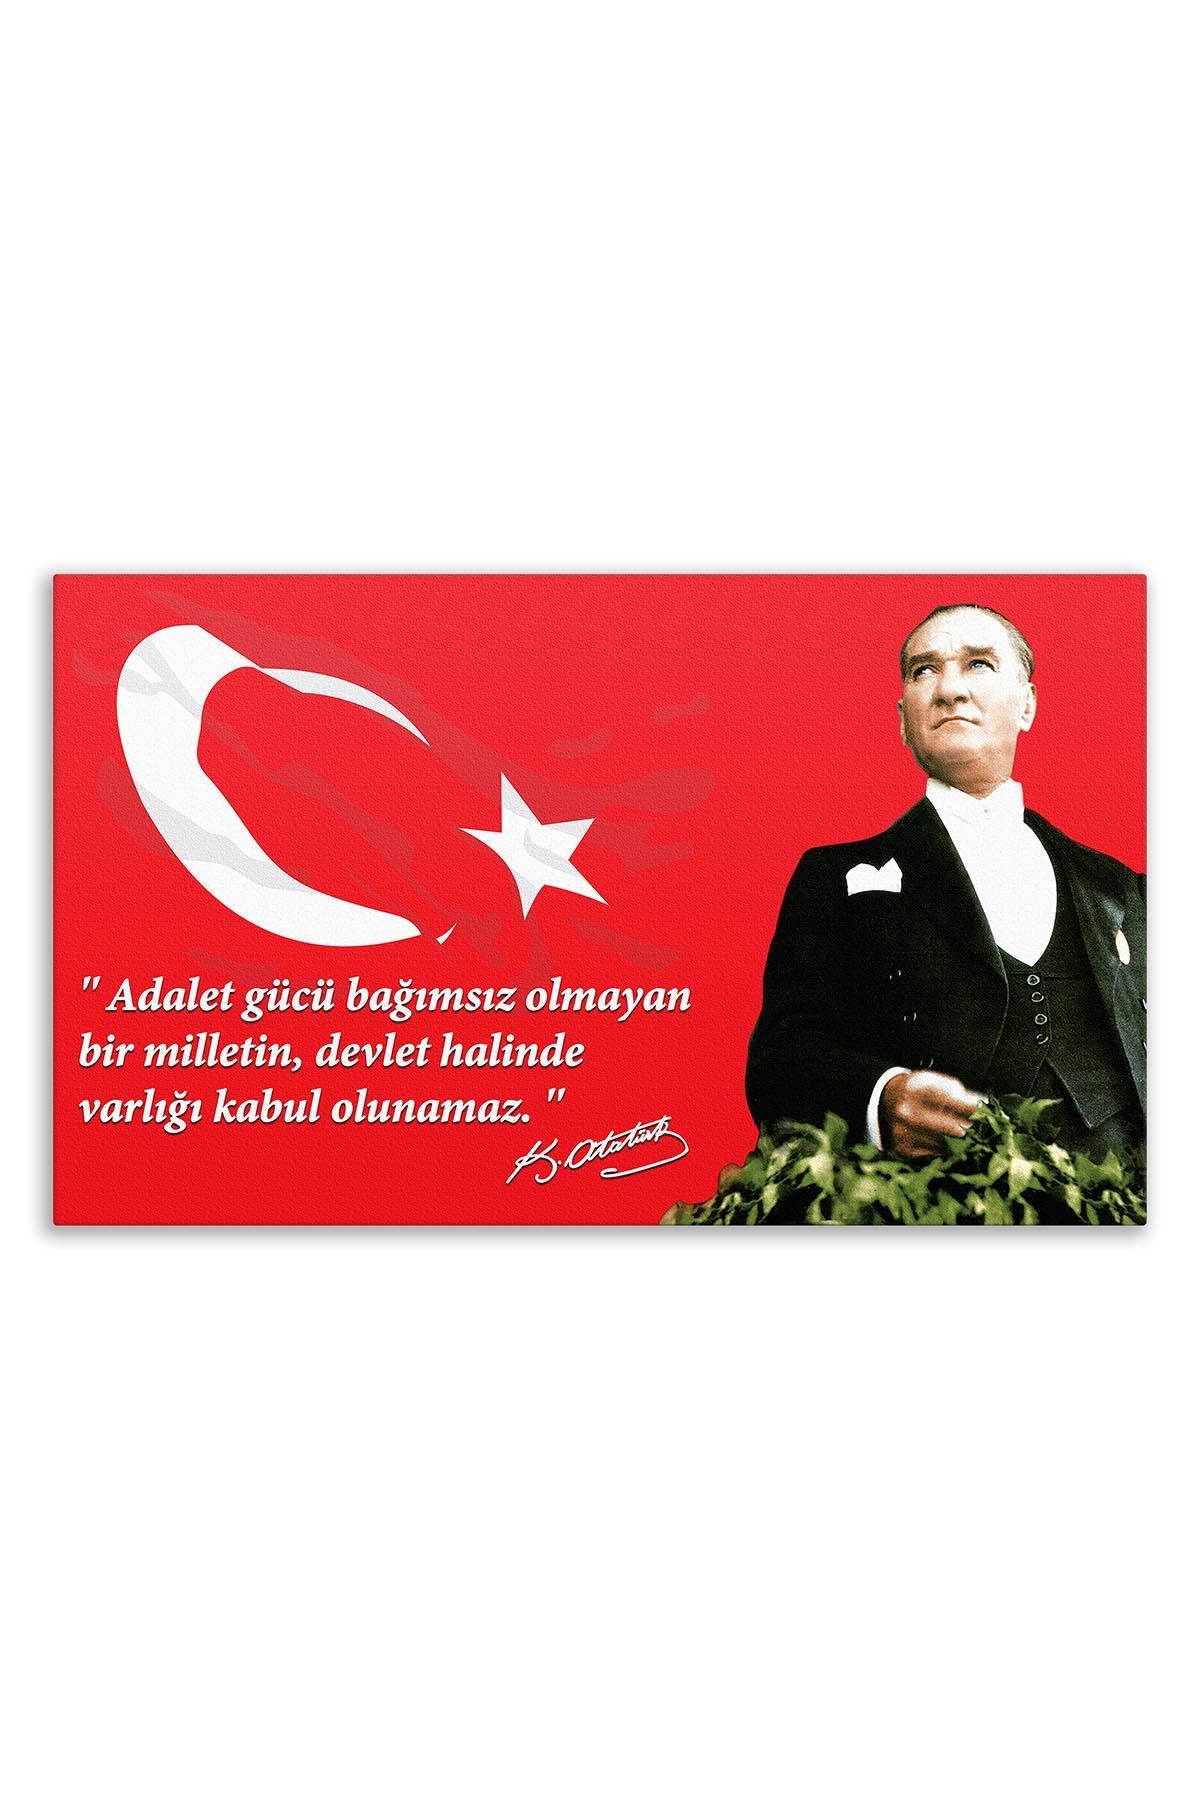 Founder of Turkiye Ataturk Canvas Board | Printed Canvas Board | Customized Canvas Board